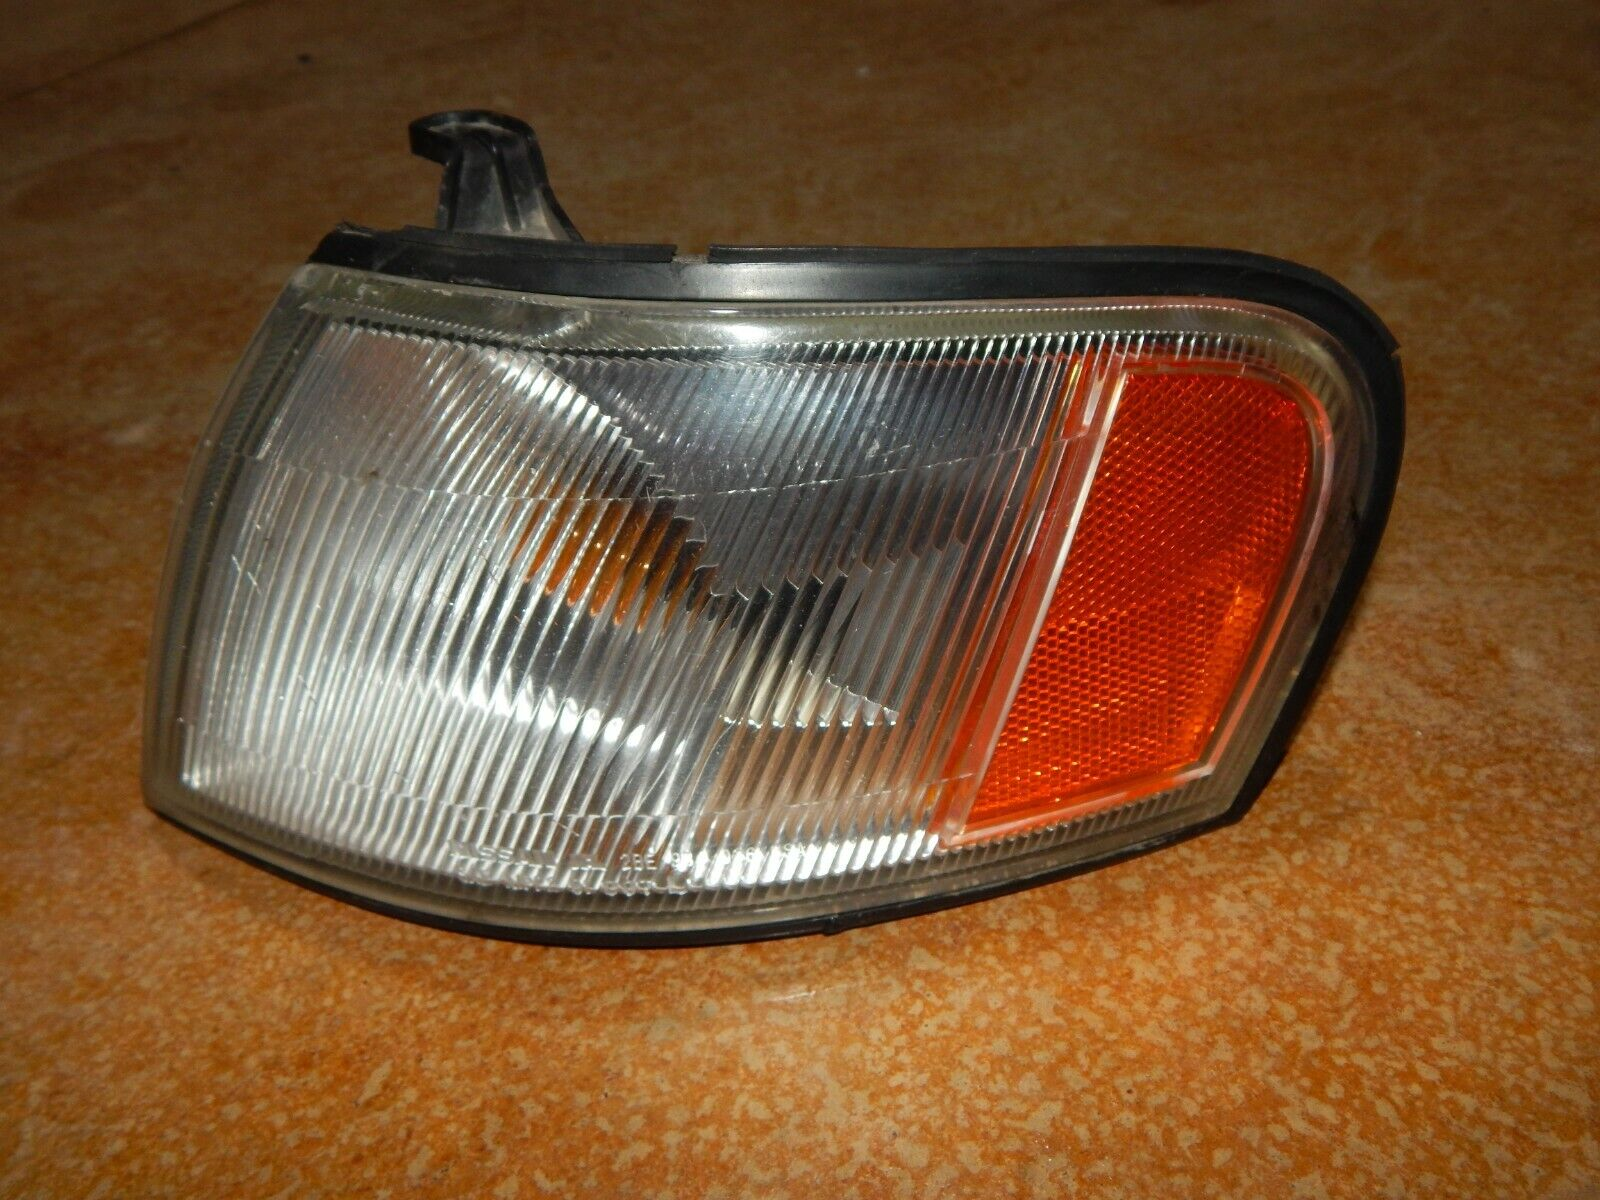 95 96 97 98 99 Nissan Sentra 95 96 97 98 200SX Driver LH Corner Light Factory